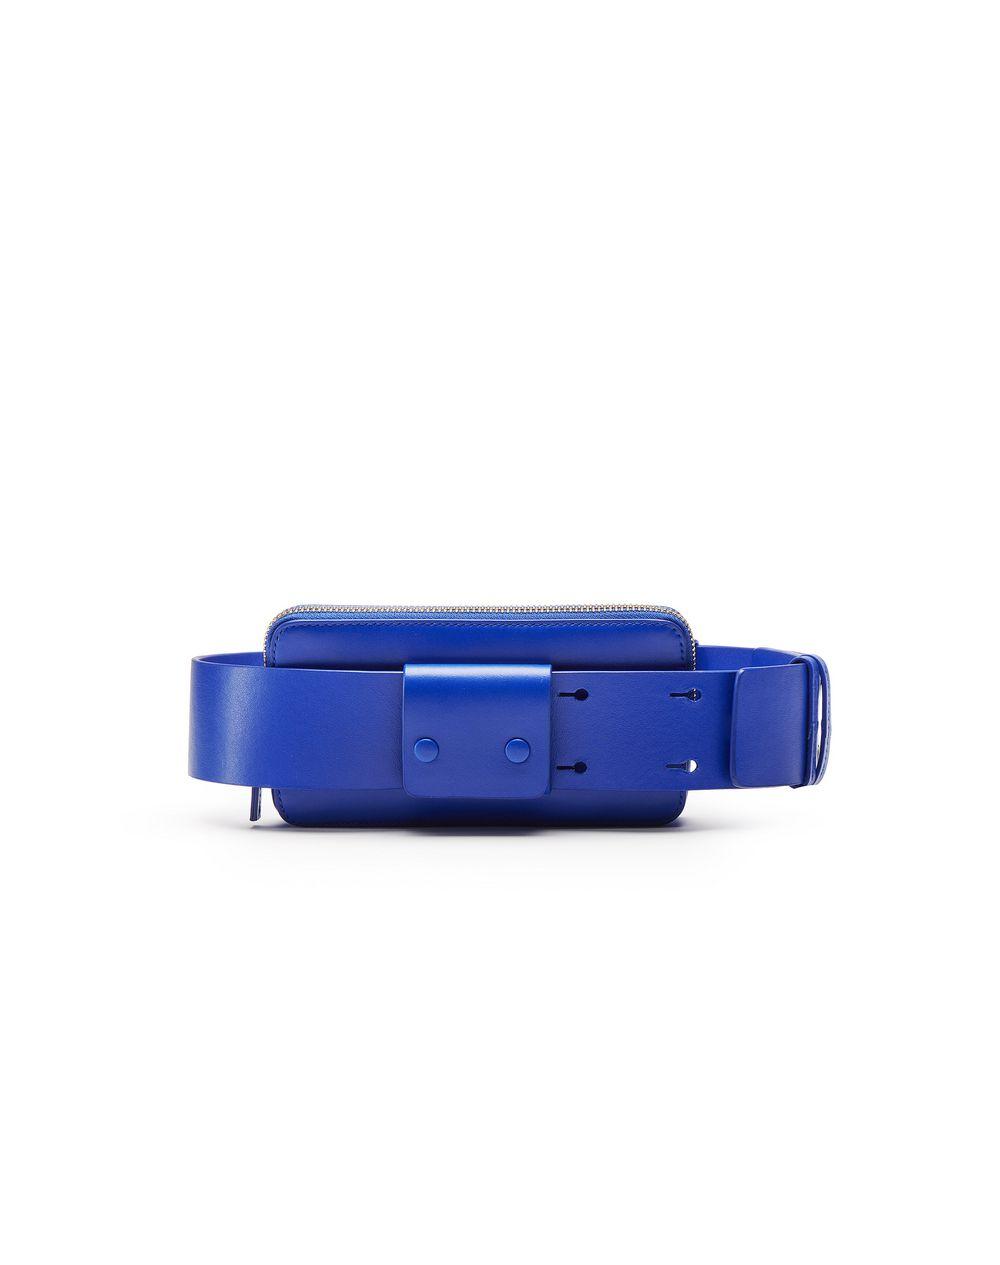 ELECTRIC BLUE SMARTPHONE BELT - Lanvin